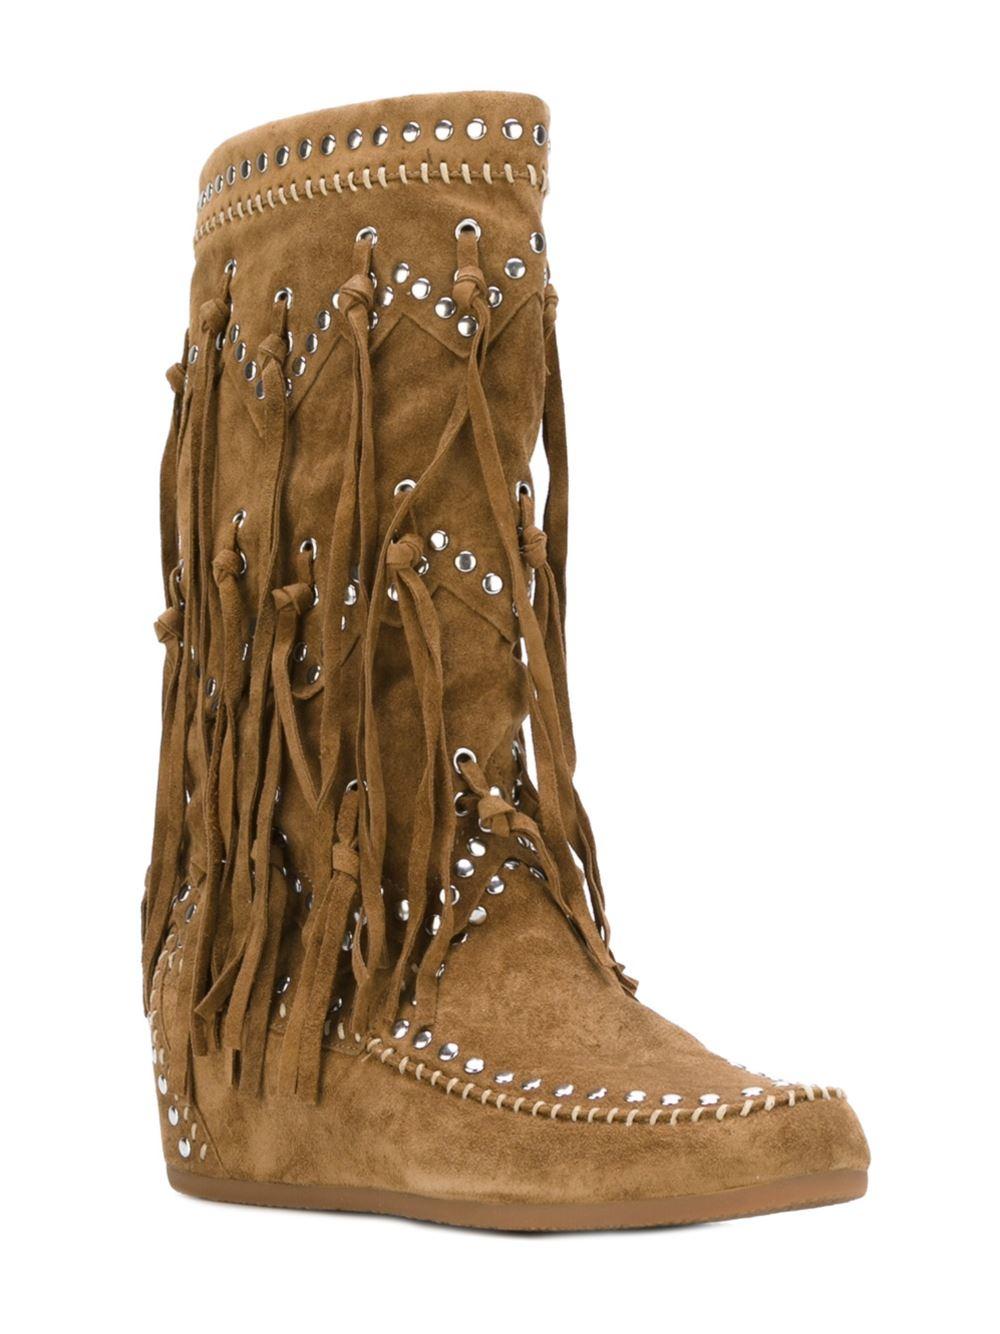 Ash Cotton 'shilo' Boots in Brown